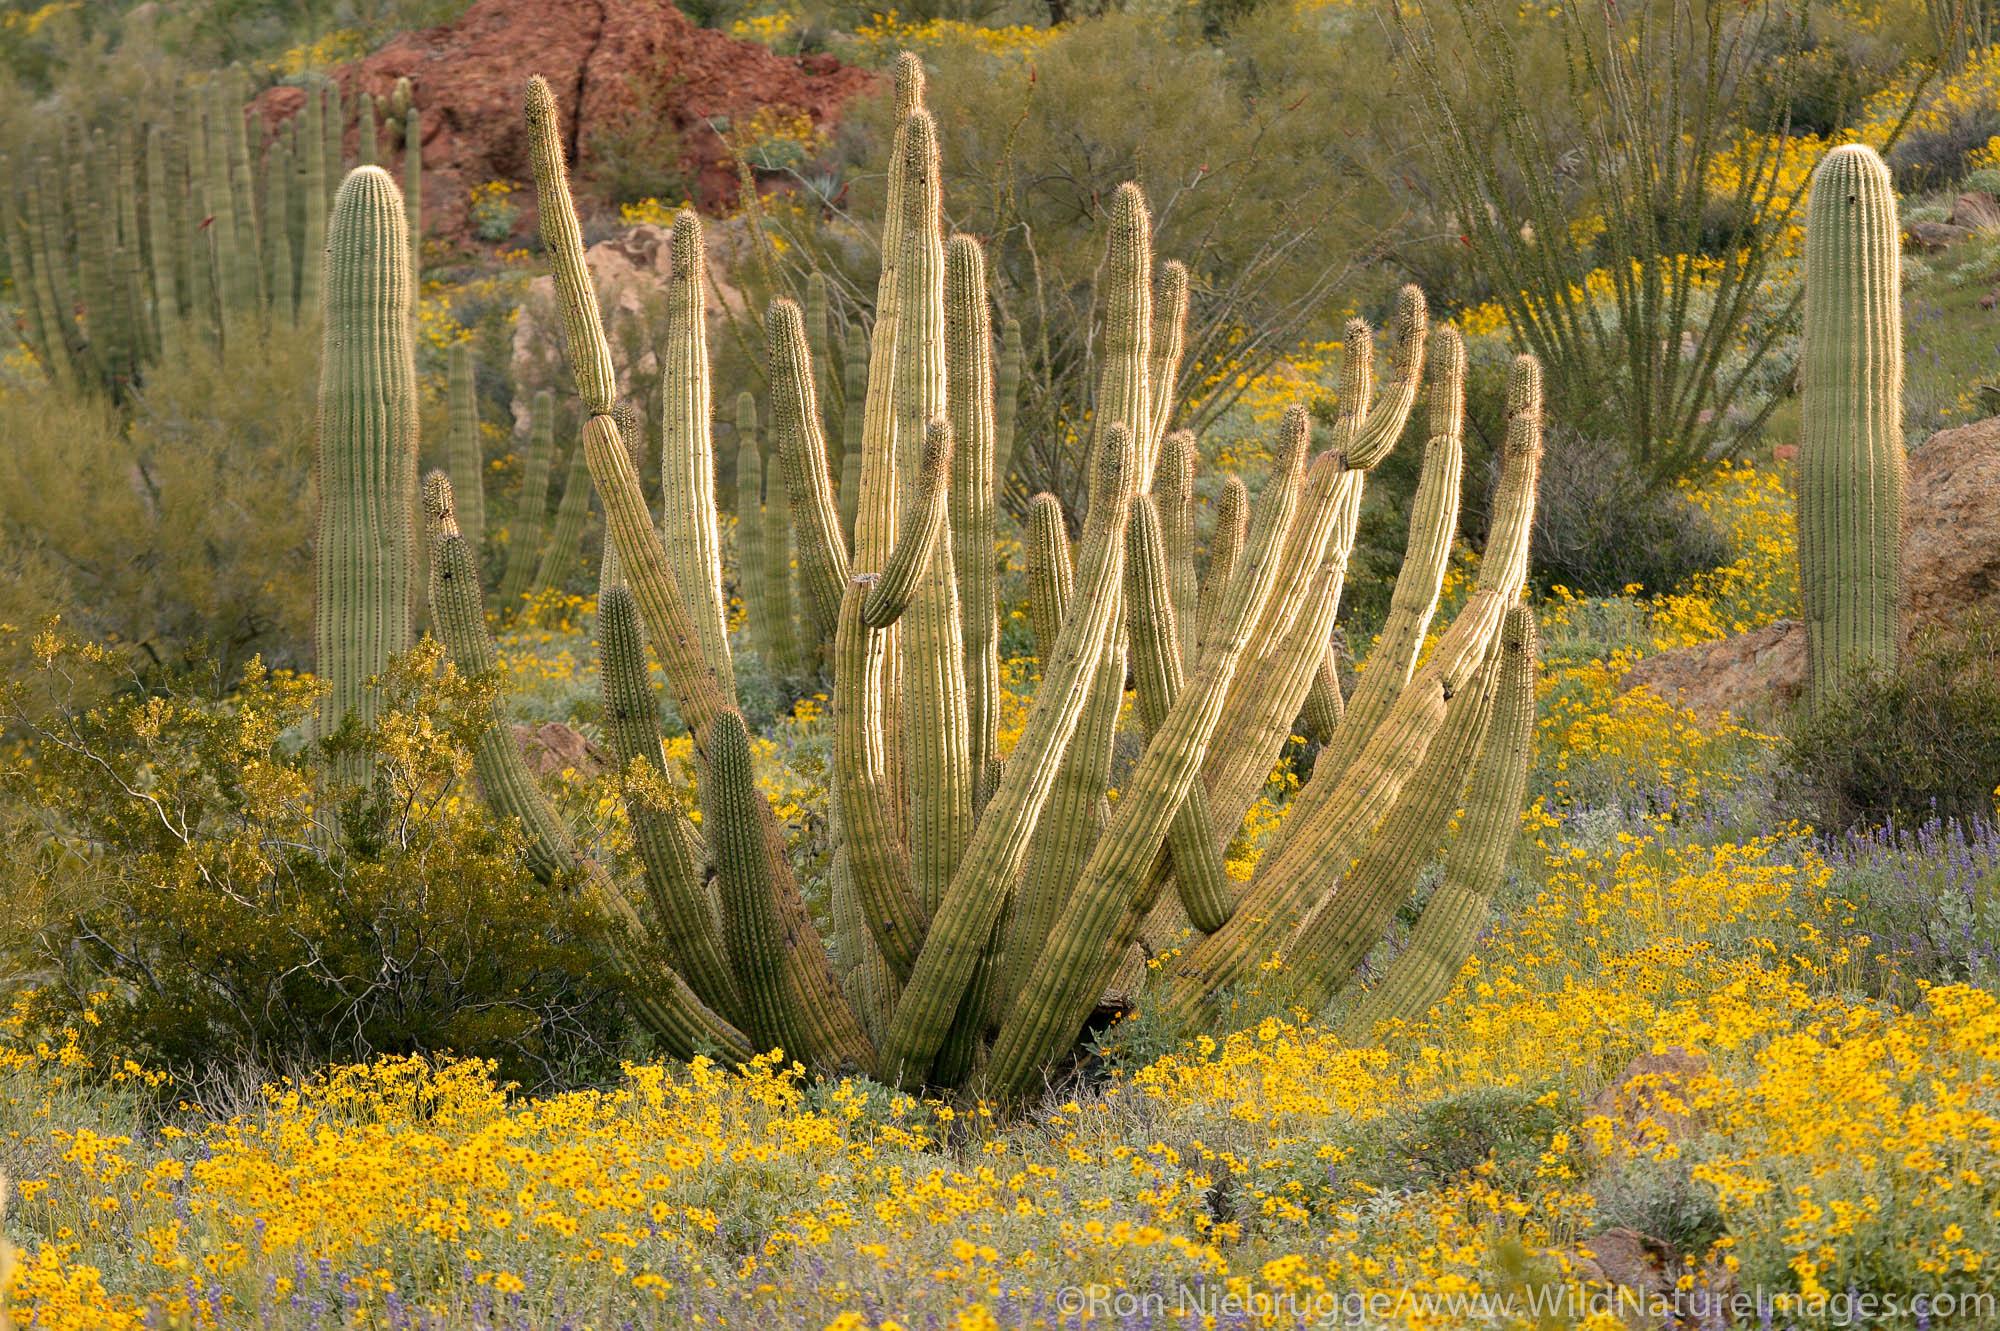 Organ Pipe Cactus (Stenocereus thurberi) with Brittlebush (Encelia farinosa) and lupine (Lupinus sparsiflorus), Organ Pipe Cactus...